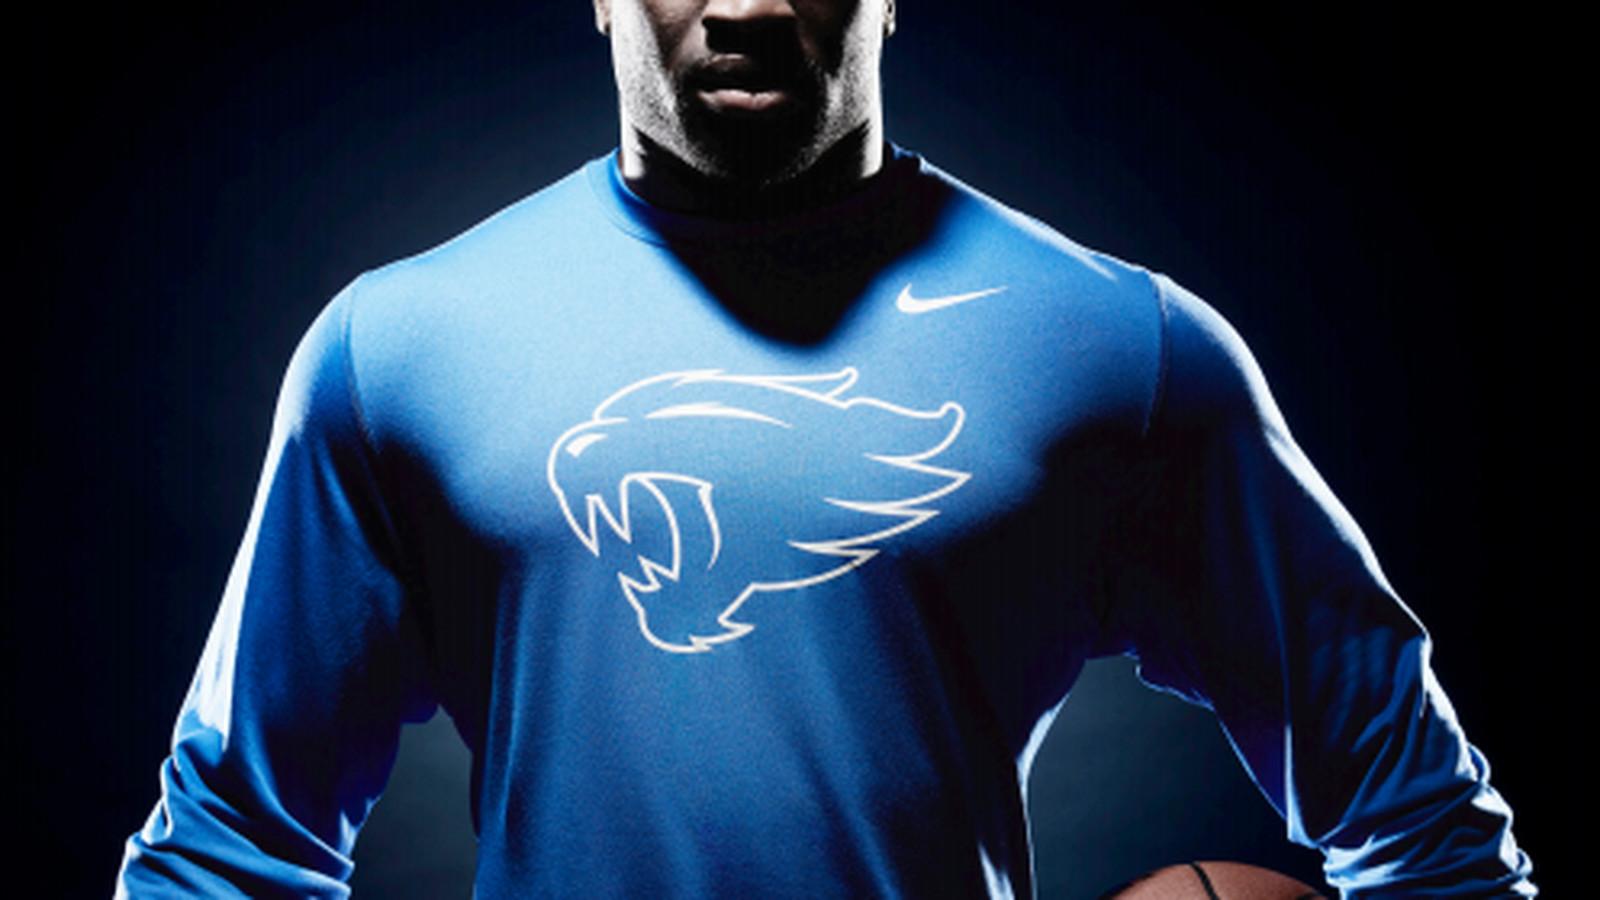 The New Kentucky Wildcats Logo Looks Like Chewbacca Mated